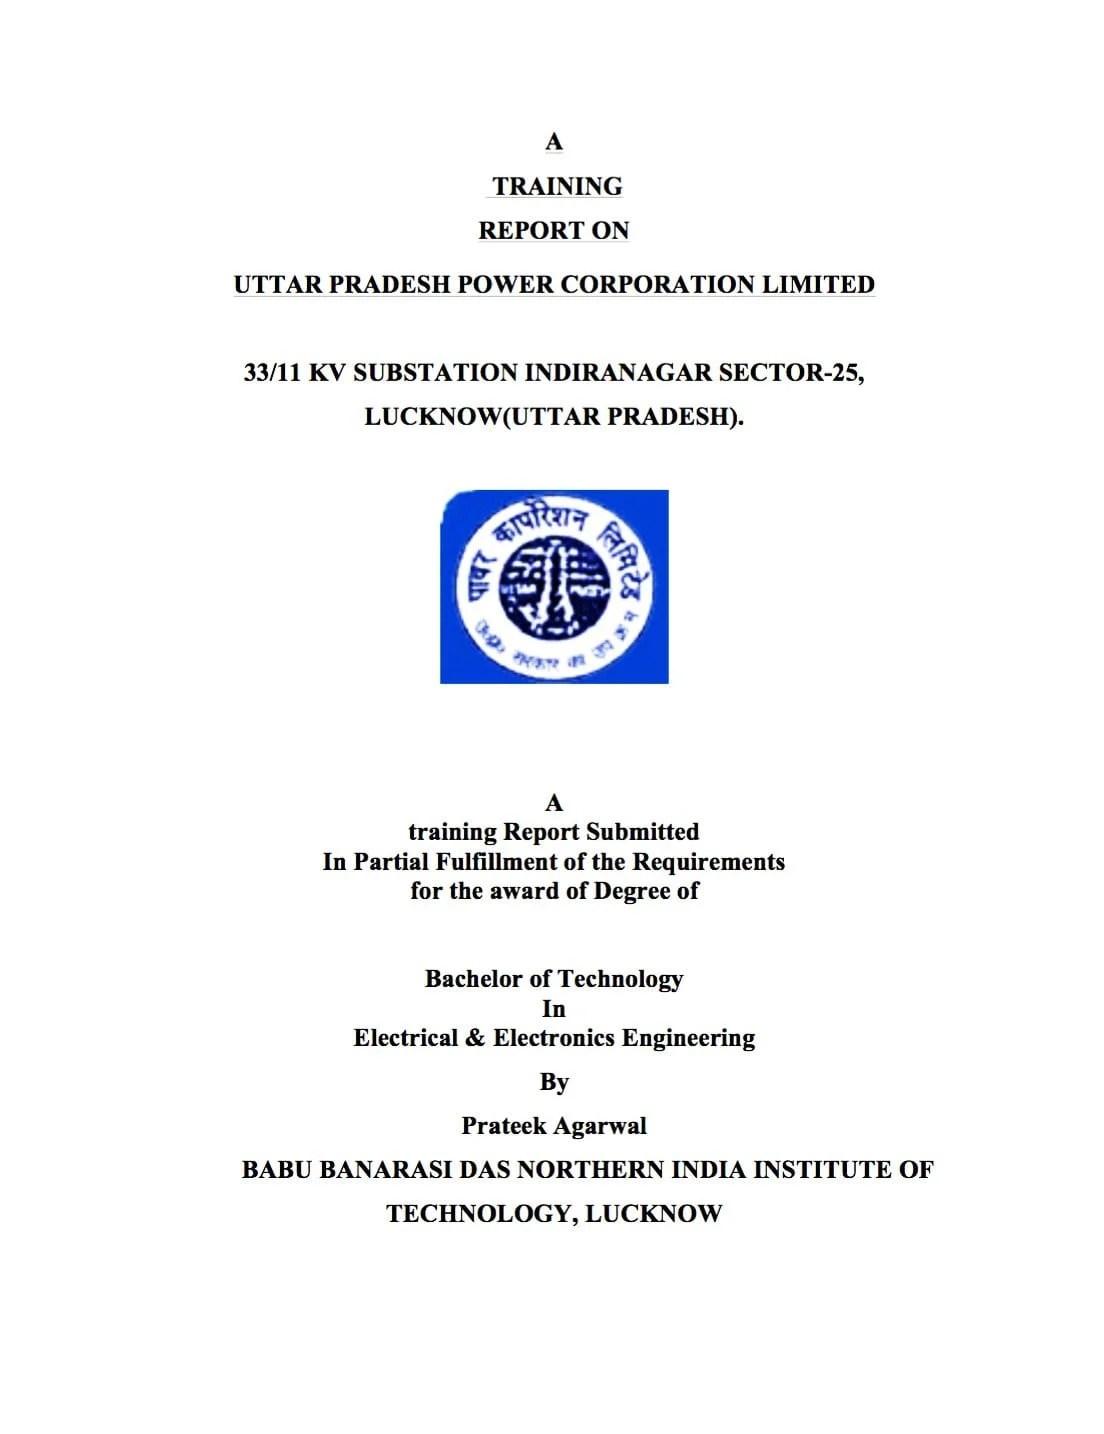 Training report on 33/11 kV power substation